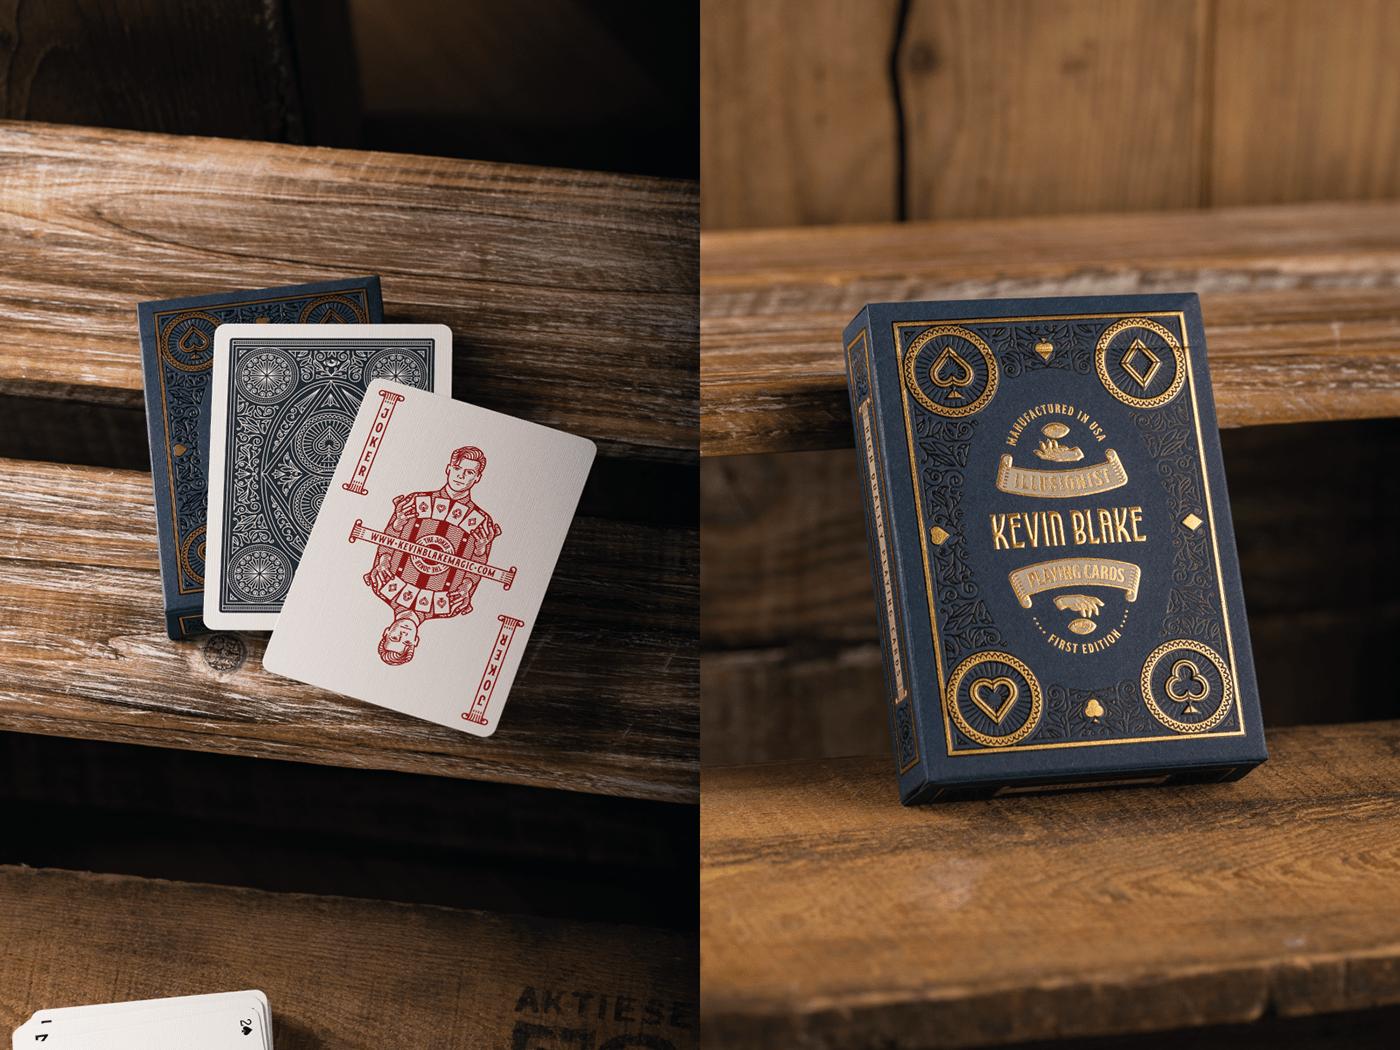 ace of spades Illusionist Illustrator joker line art Magic   packaging design Peter Voth Design Playing Cards vector